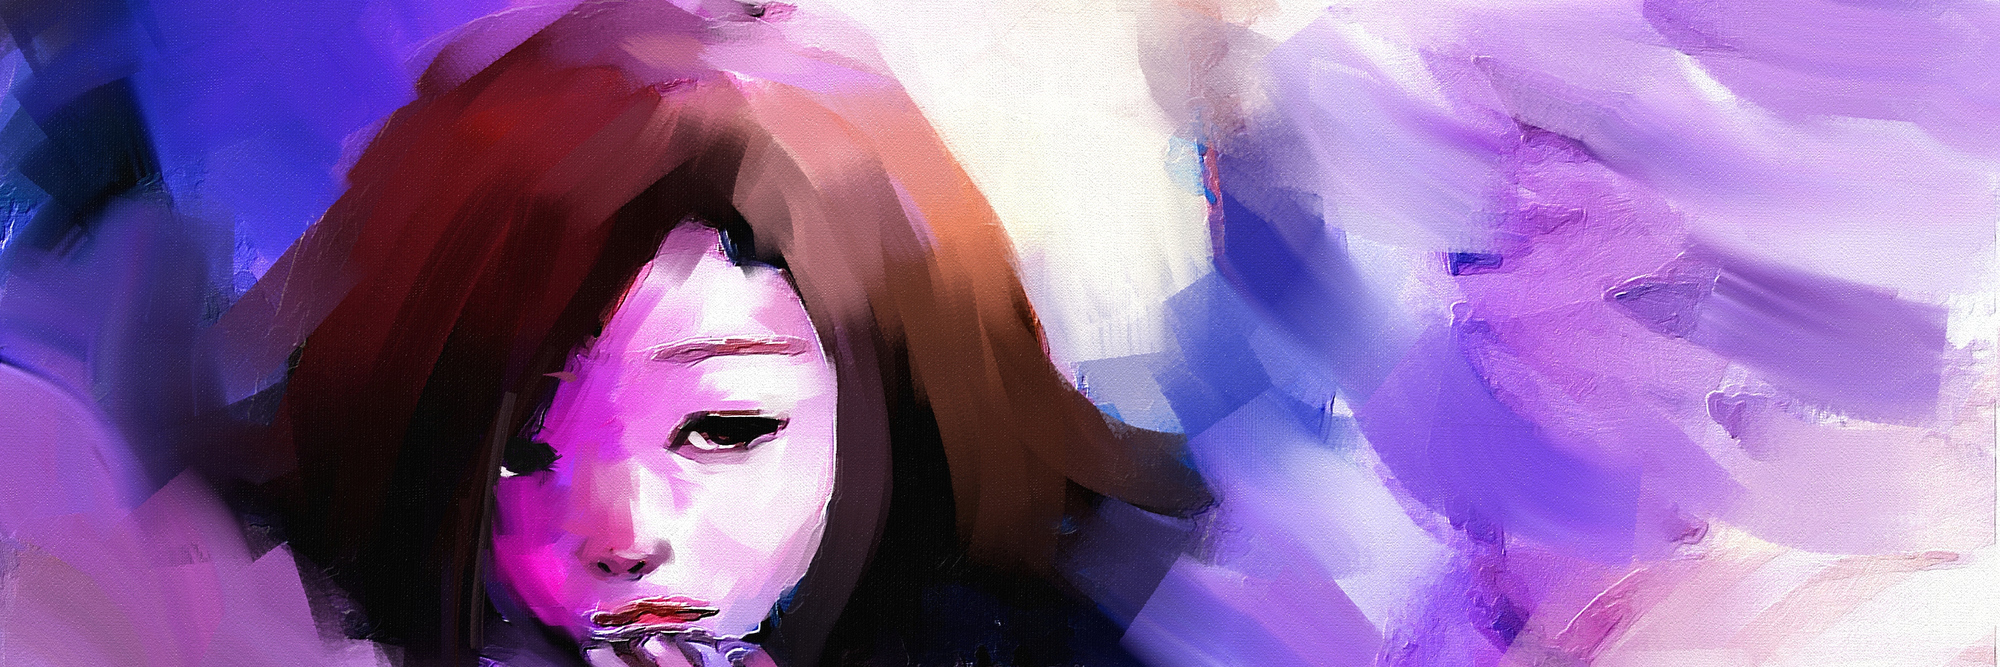 digital painting of girl dressed as an angel